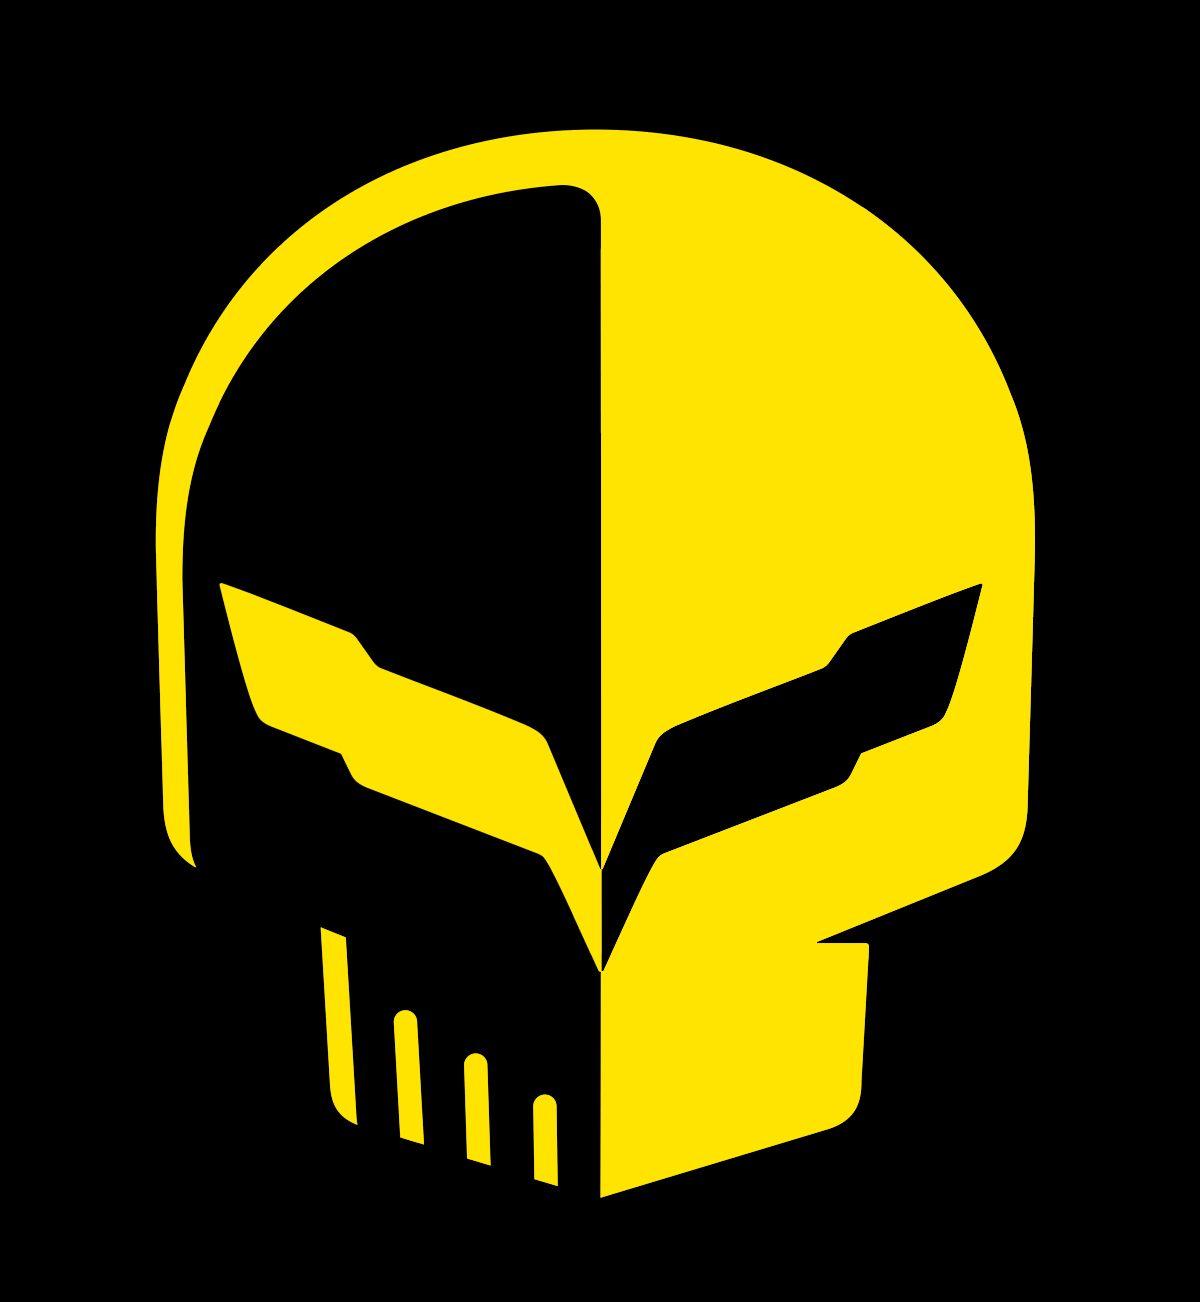 The skull logos pinterest corvette chevrolet corvette and cars buycottarizona Image collections